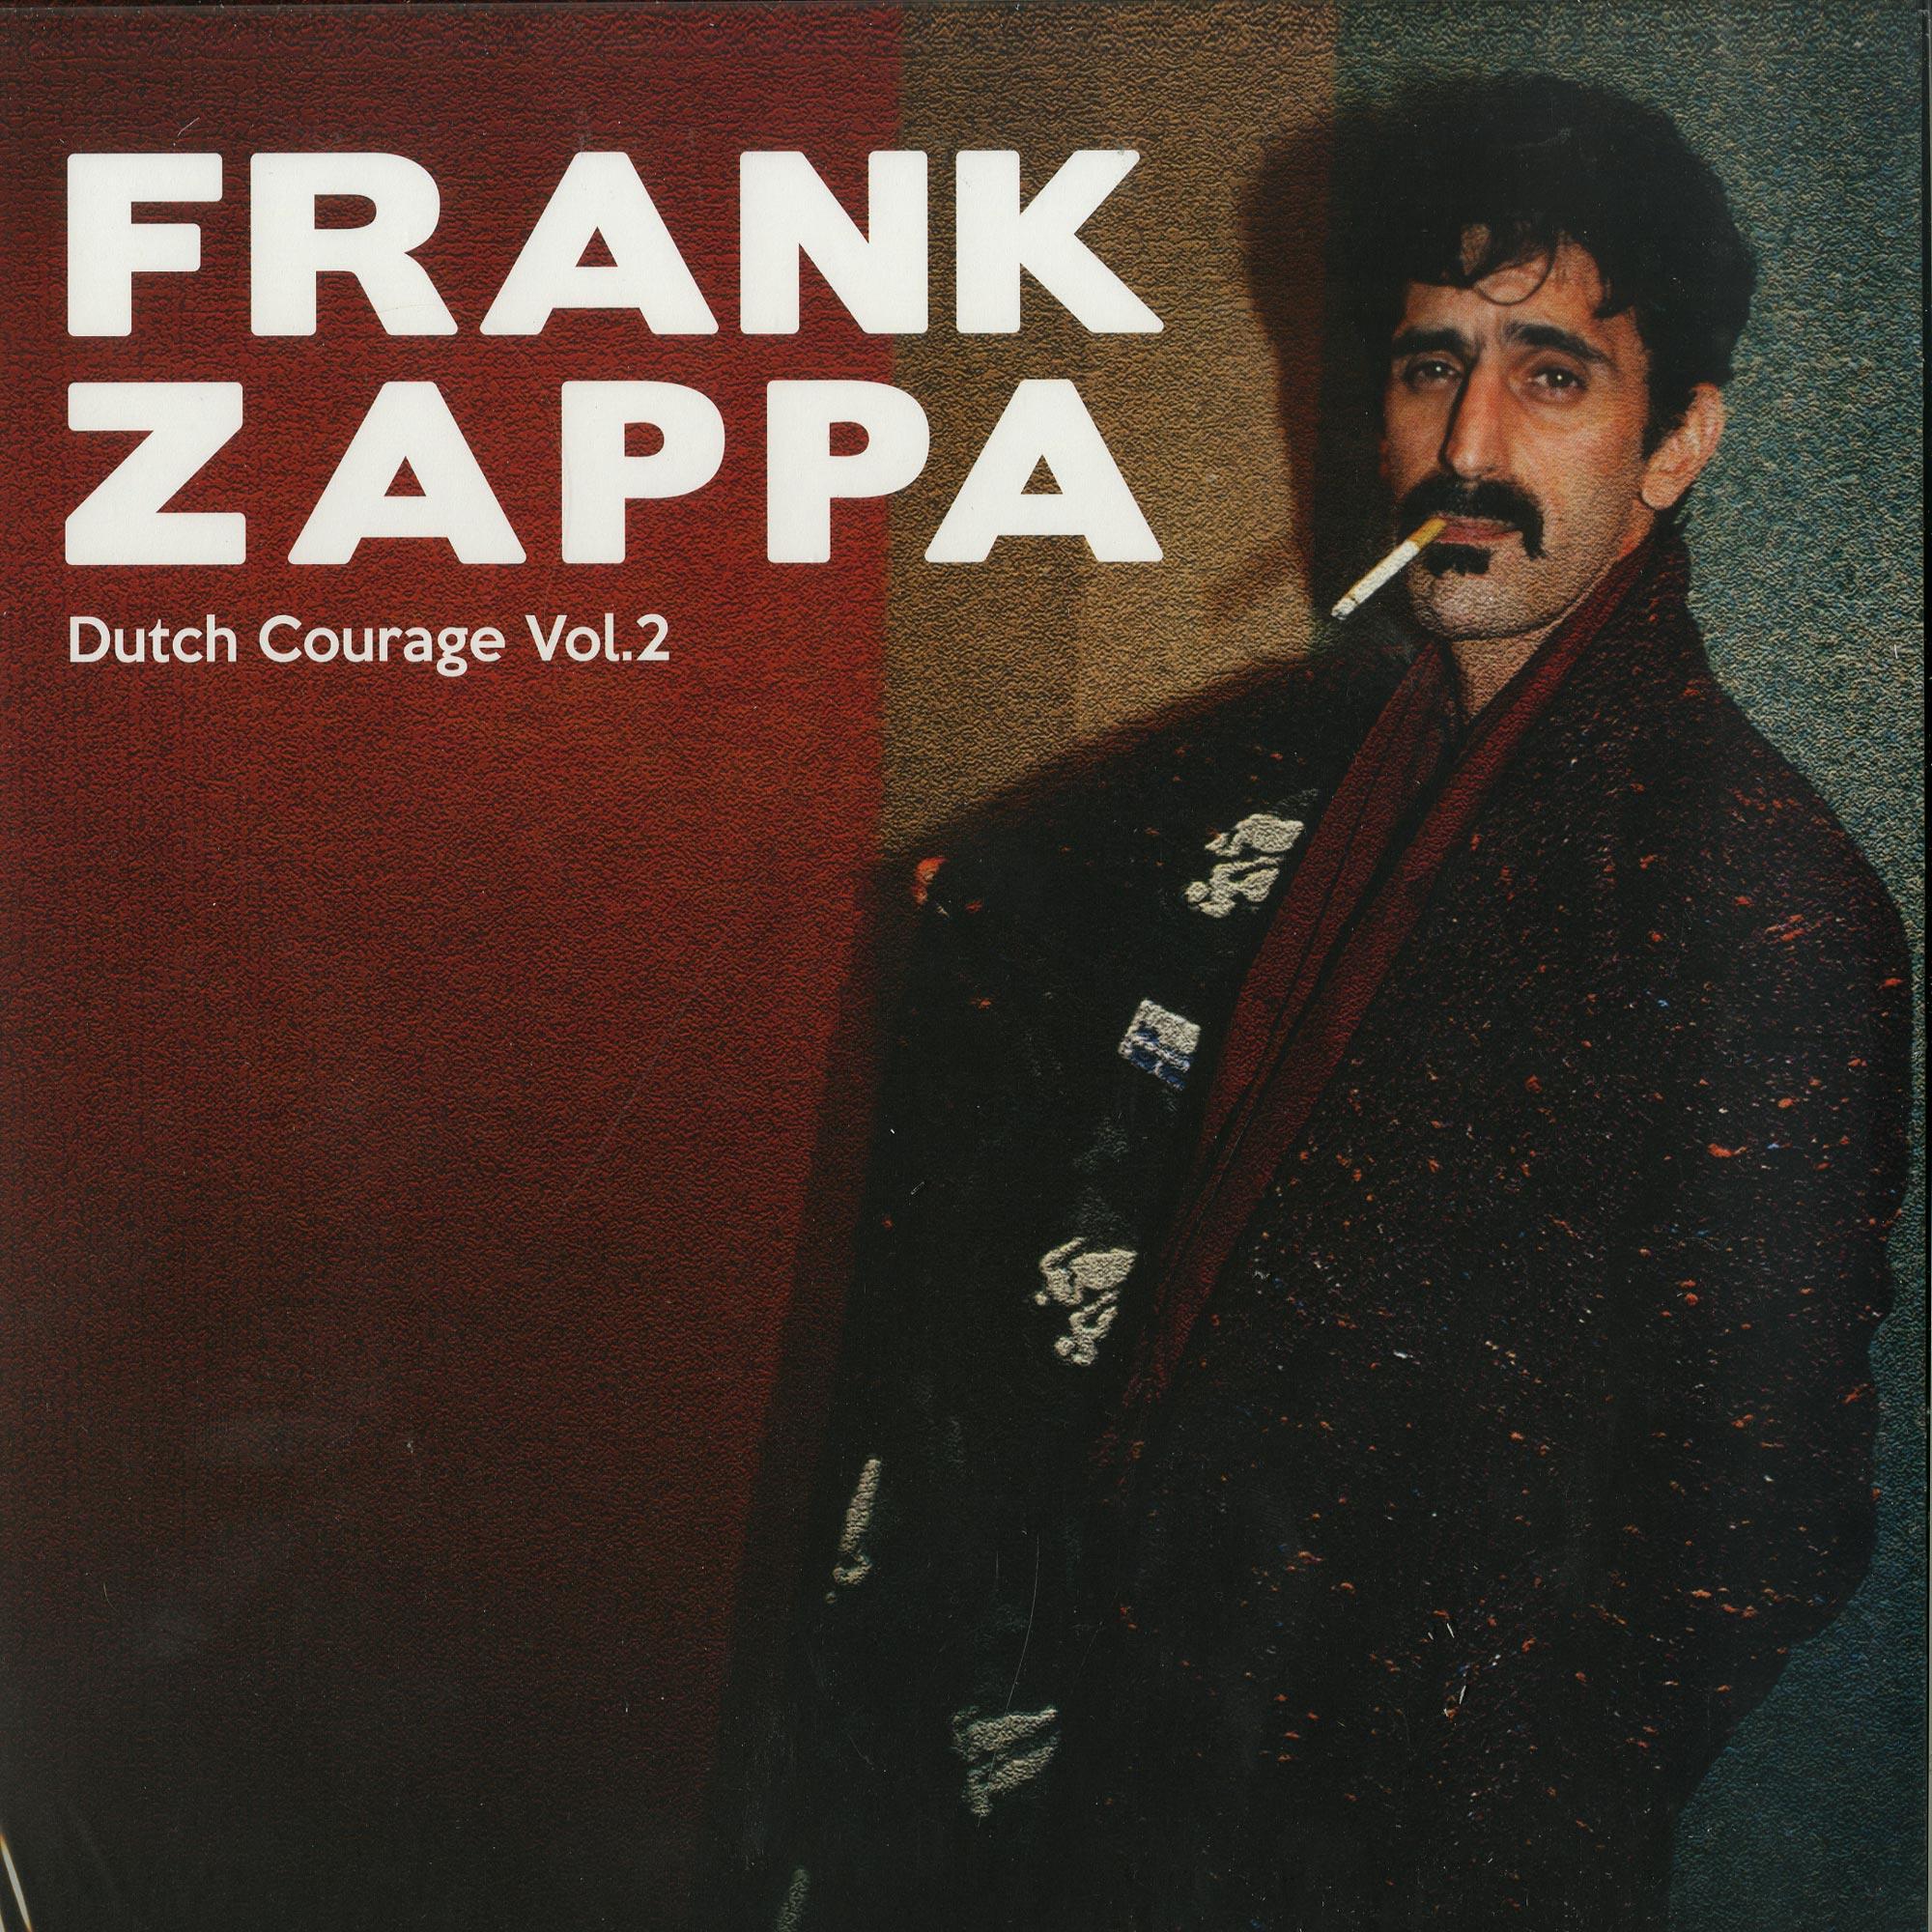 Frank Zappa - DUTCH COURAGE VOL. 2